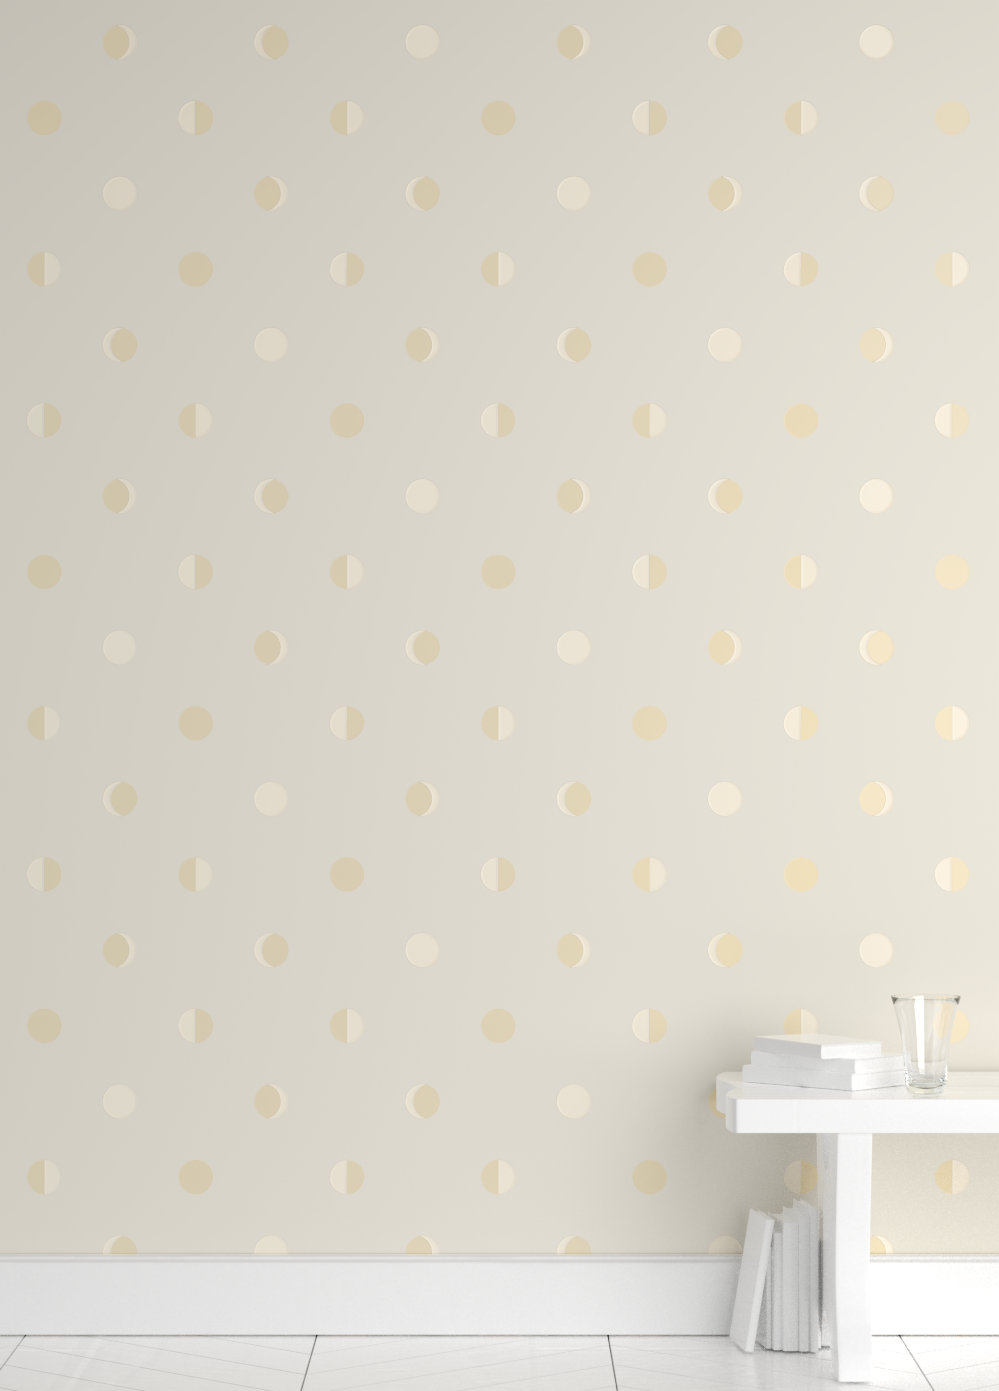 Bartsch-new-Moon-Crescents-wallpaper-wp5005040